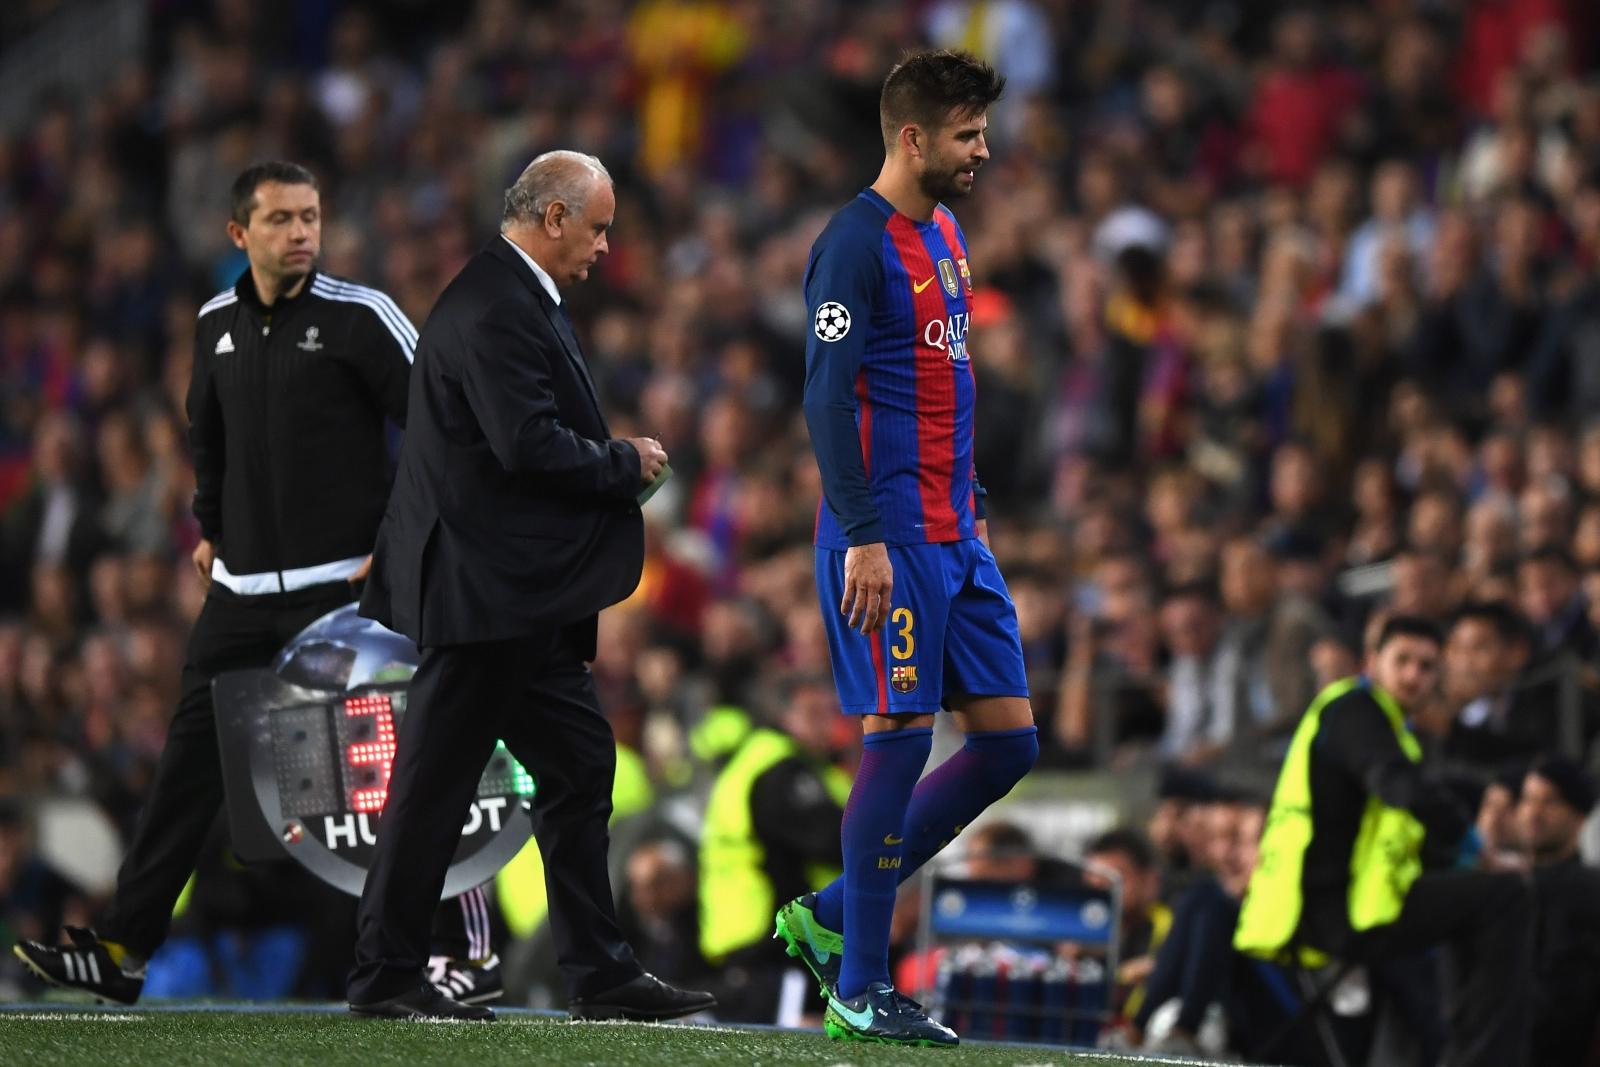 Gerard Pique will miss Barcelona's return trip Manchester City through injury